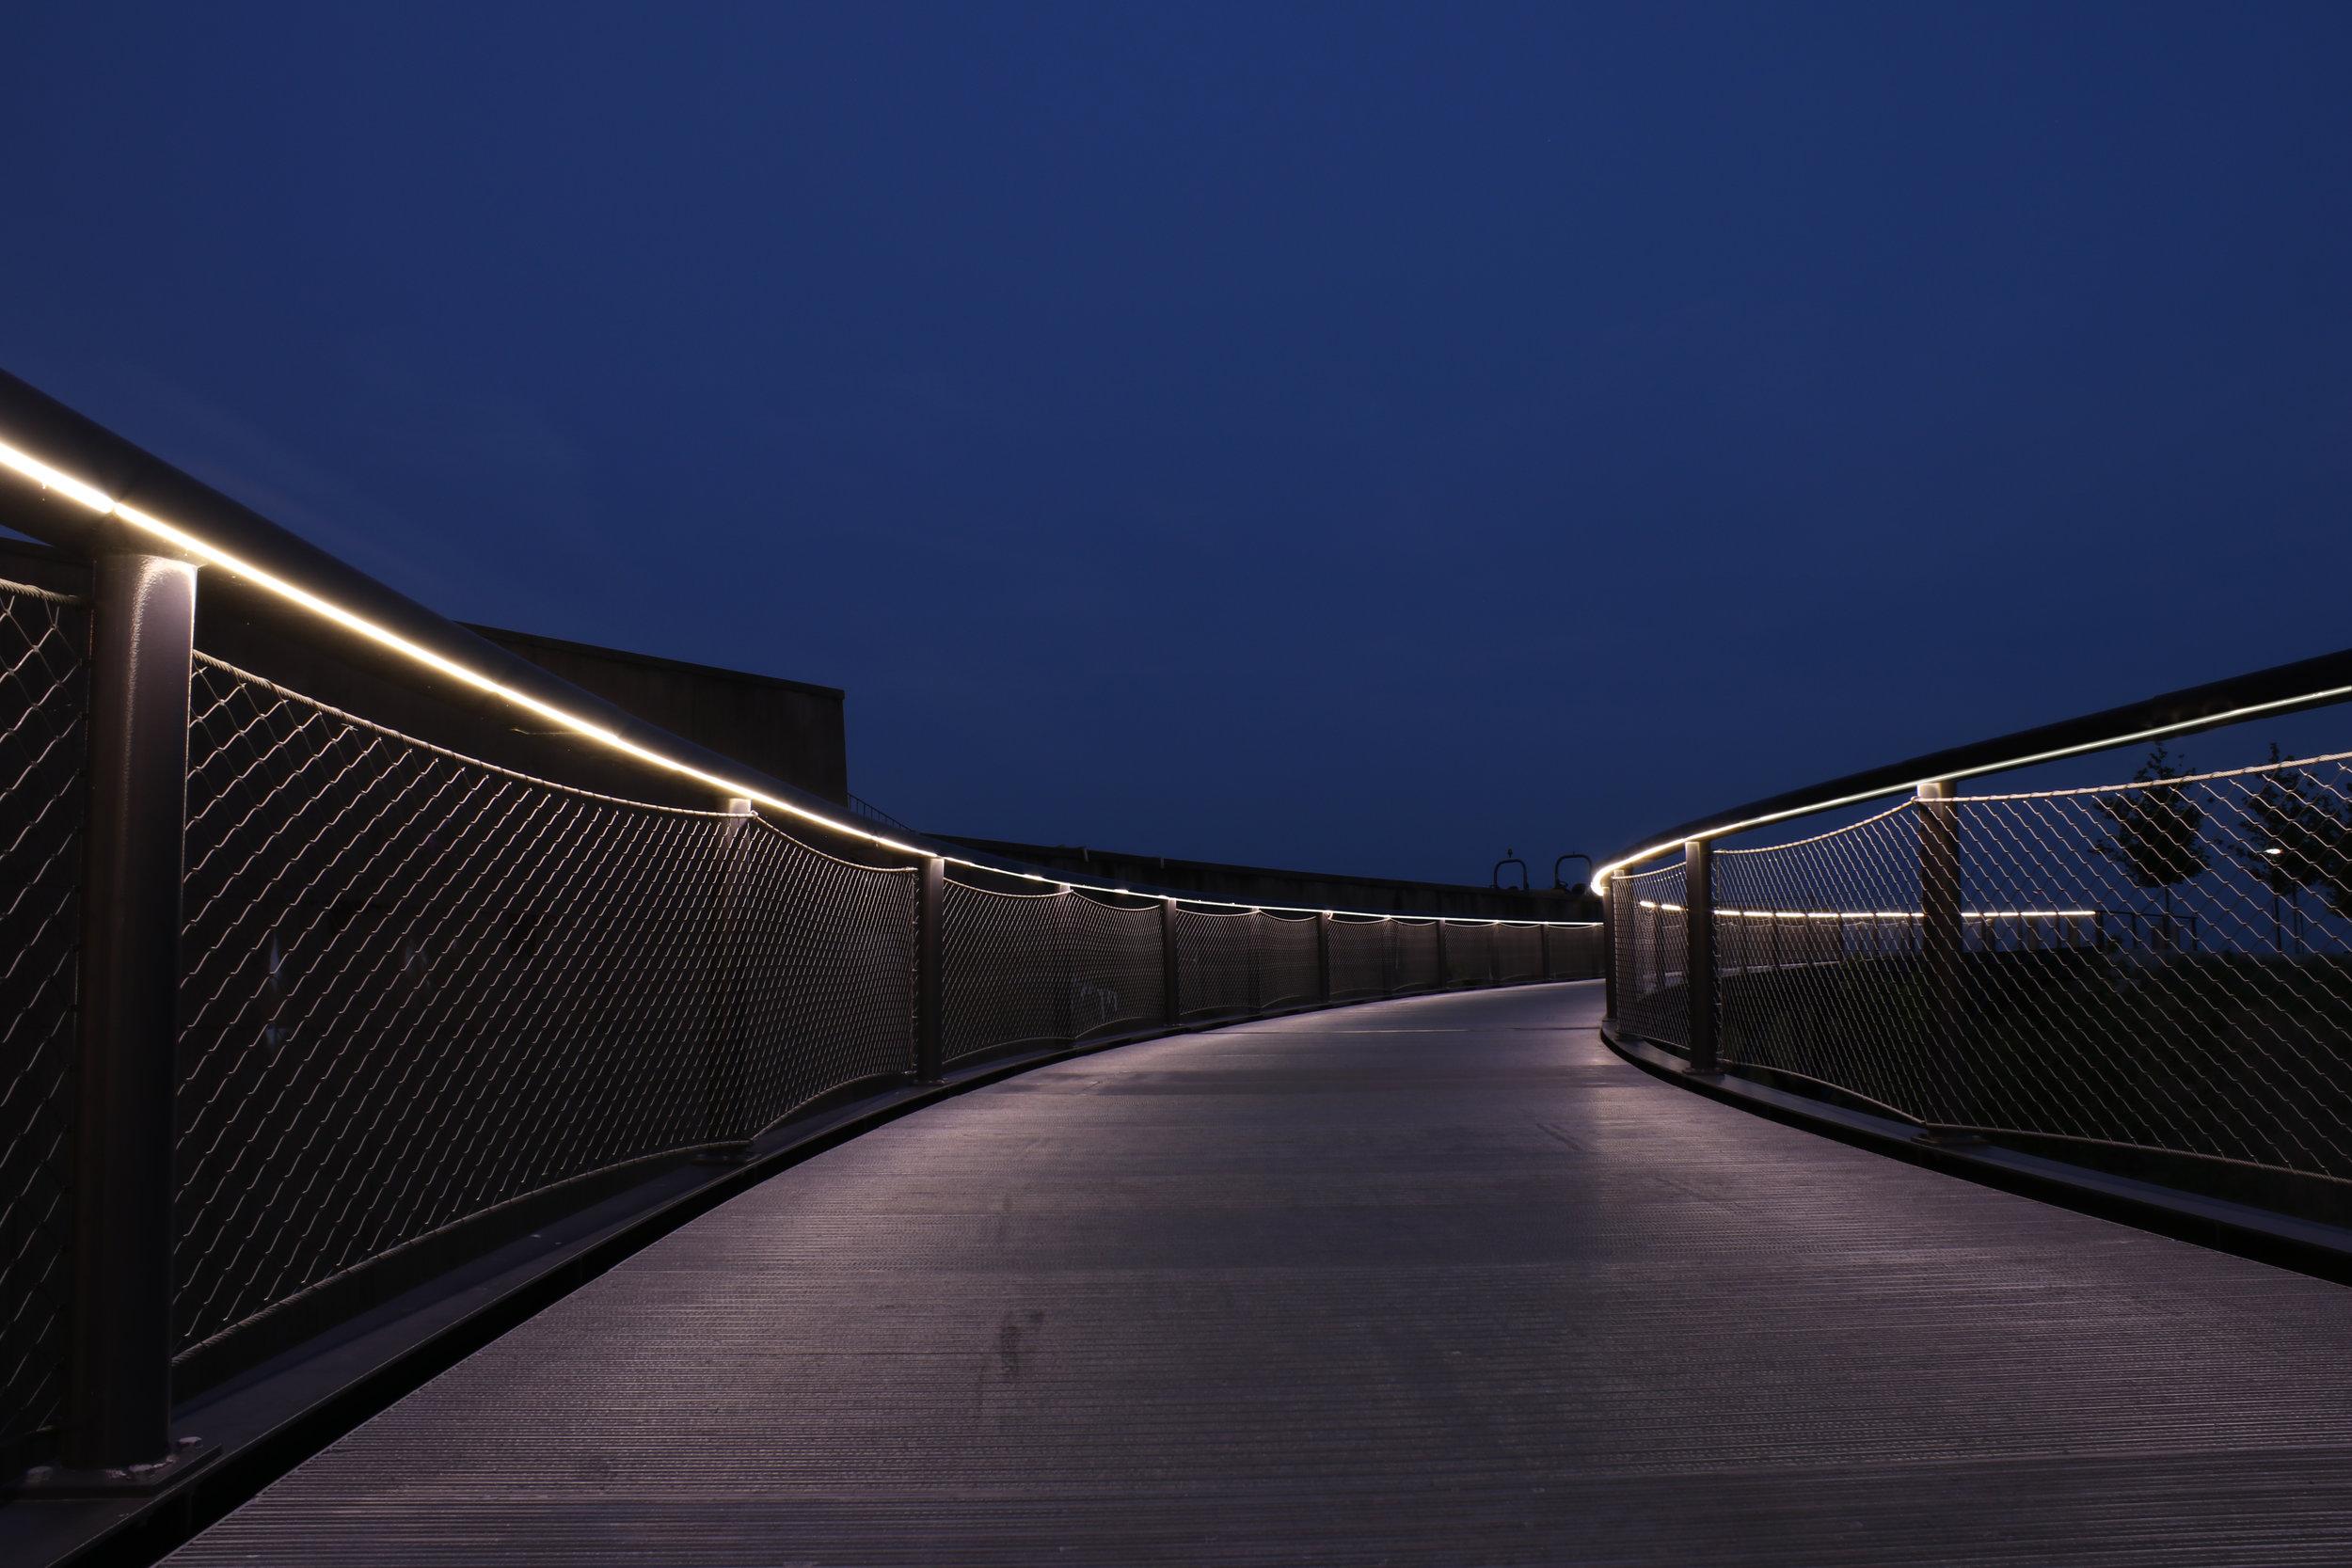 iLight-4-St-Louis-Arch-Park-plexineon-handrail-light-13-b.jpg